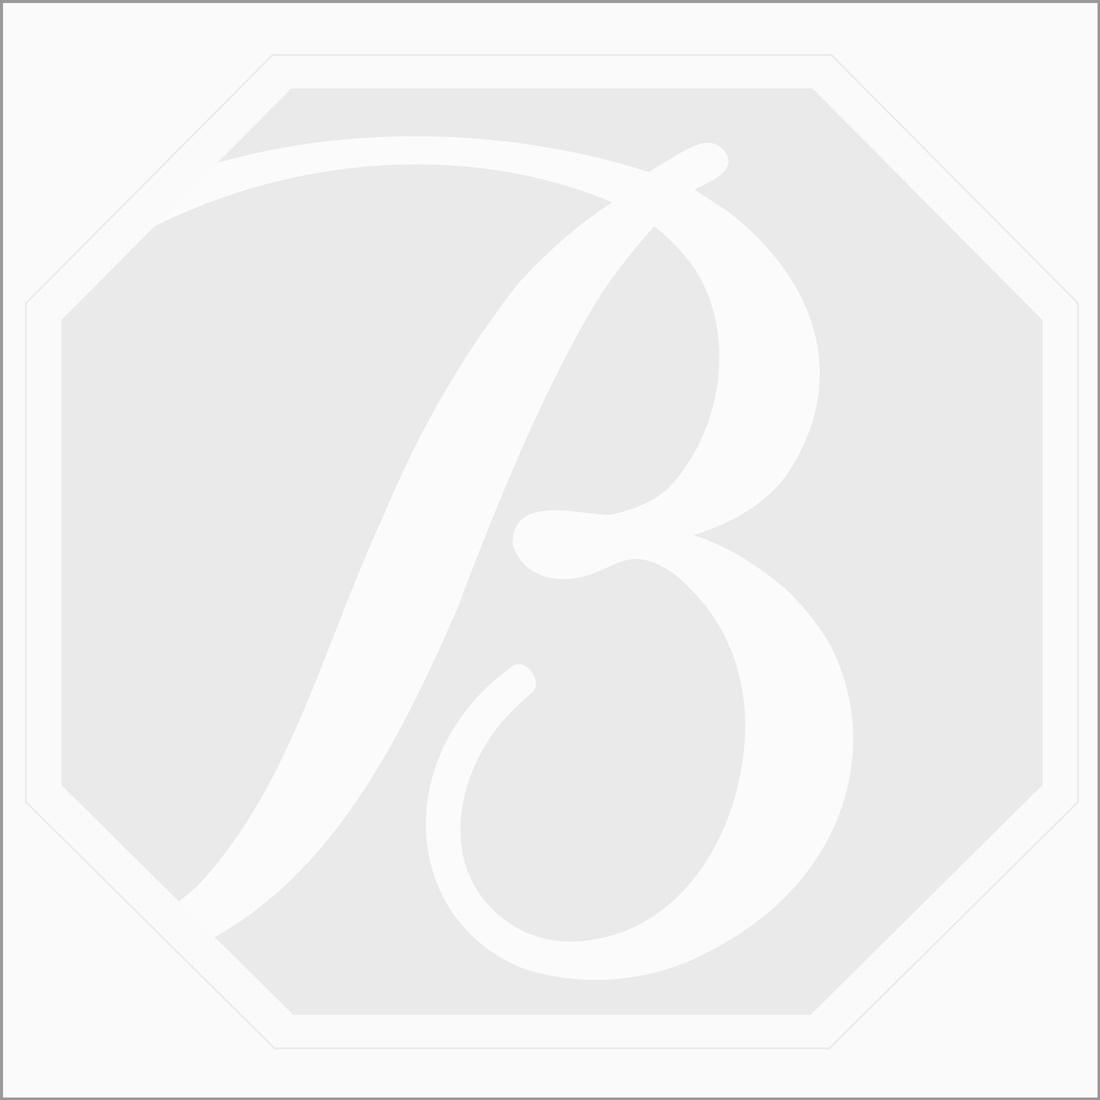 1 Pc - Dark Yellow Tourmaline Rose Cut - 8.44 ct. - 14.3 x 13.6 x 3.9 mm (TRC1001)